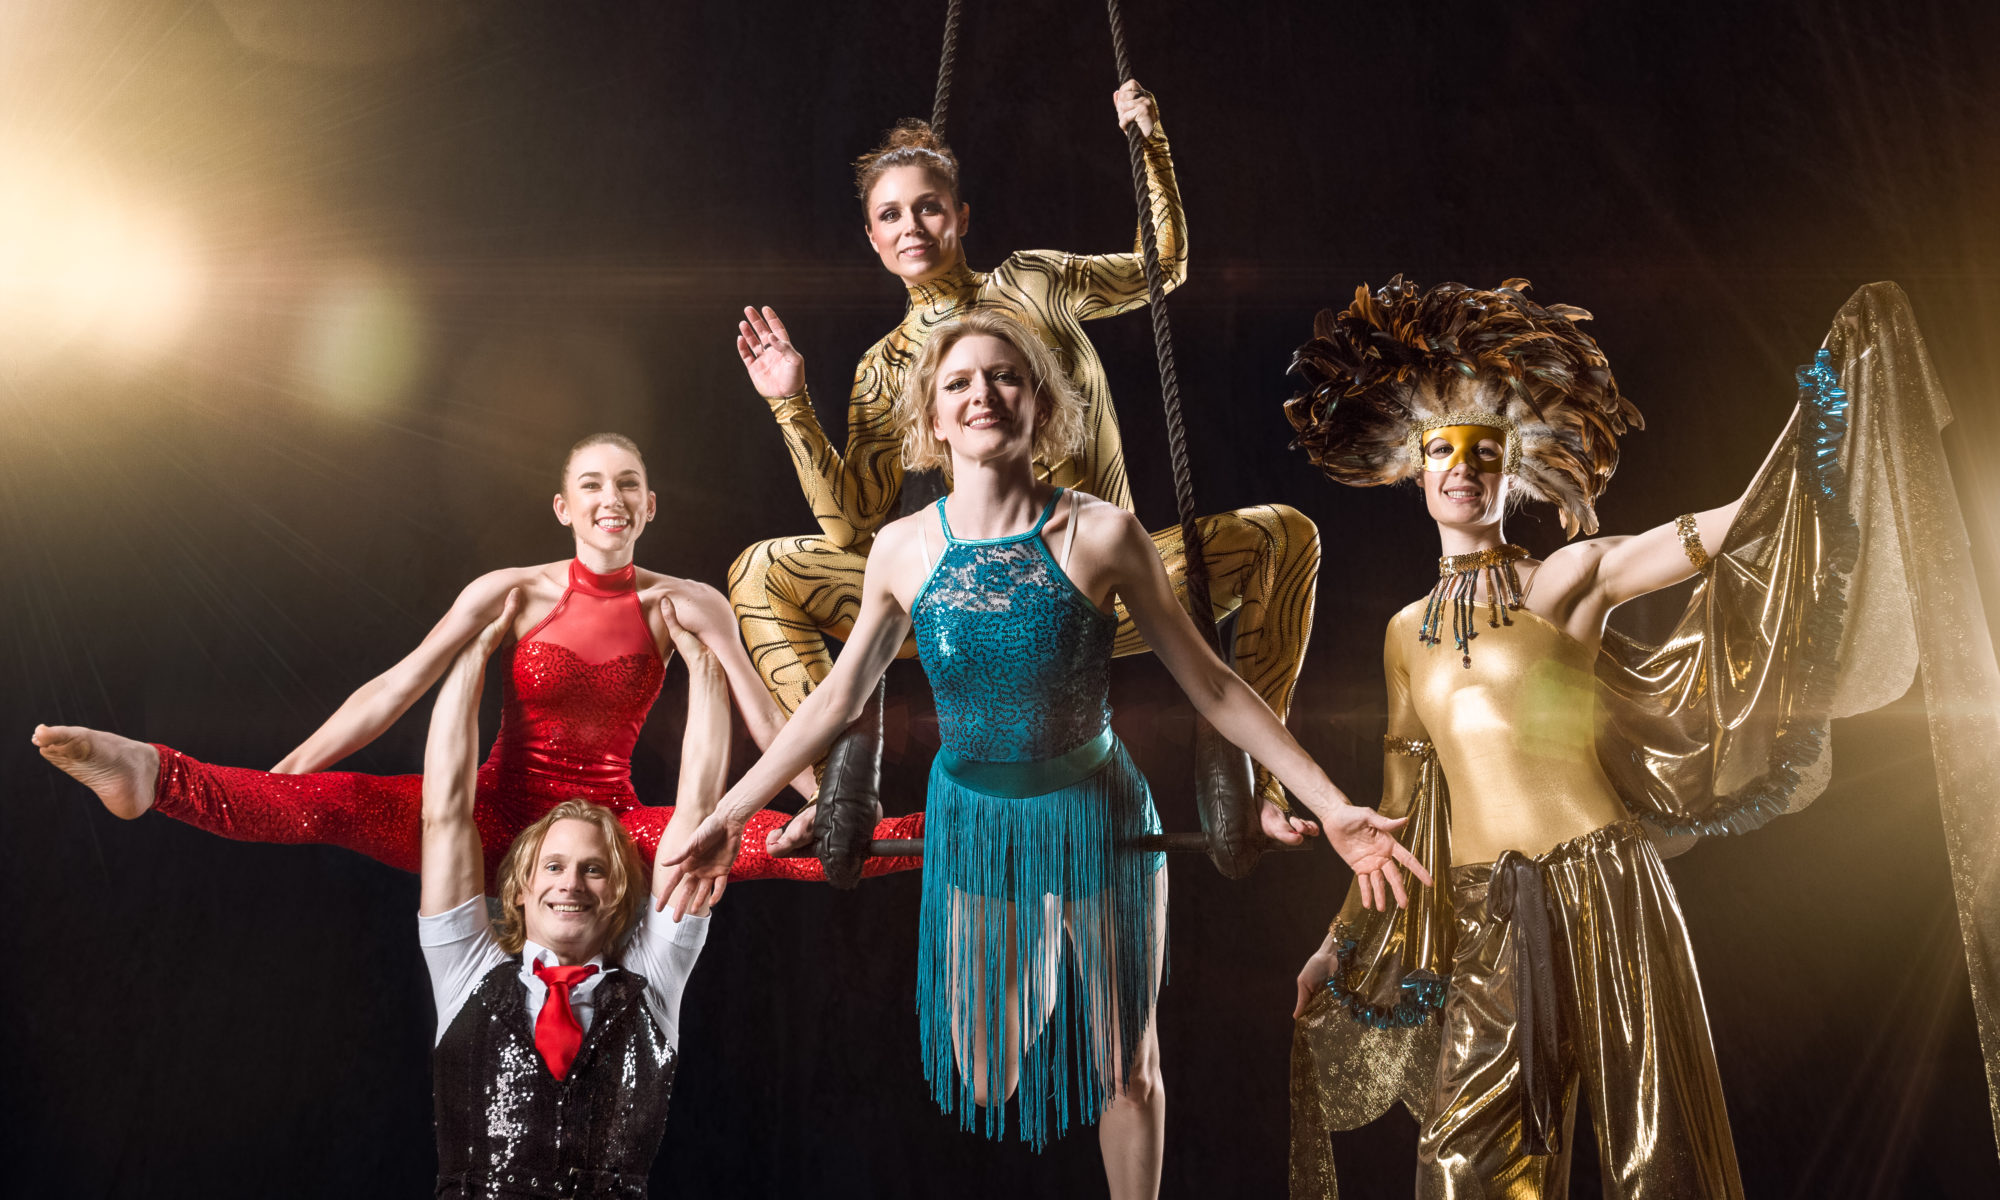 Circus Performers Charleston